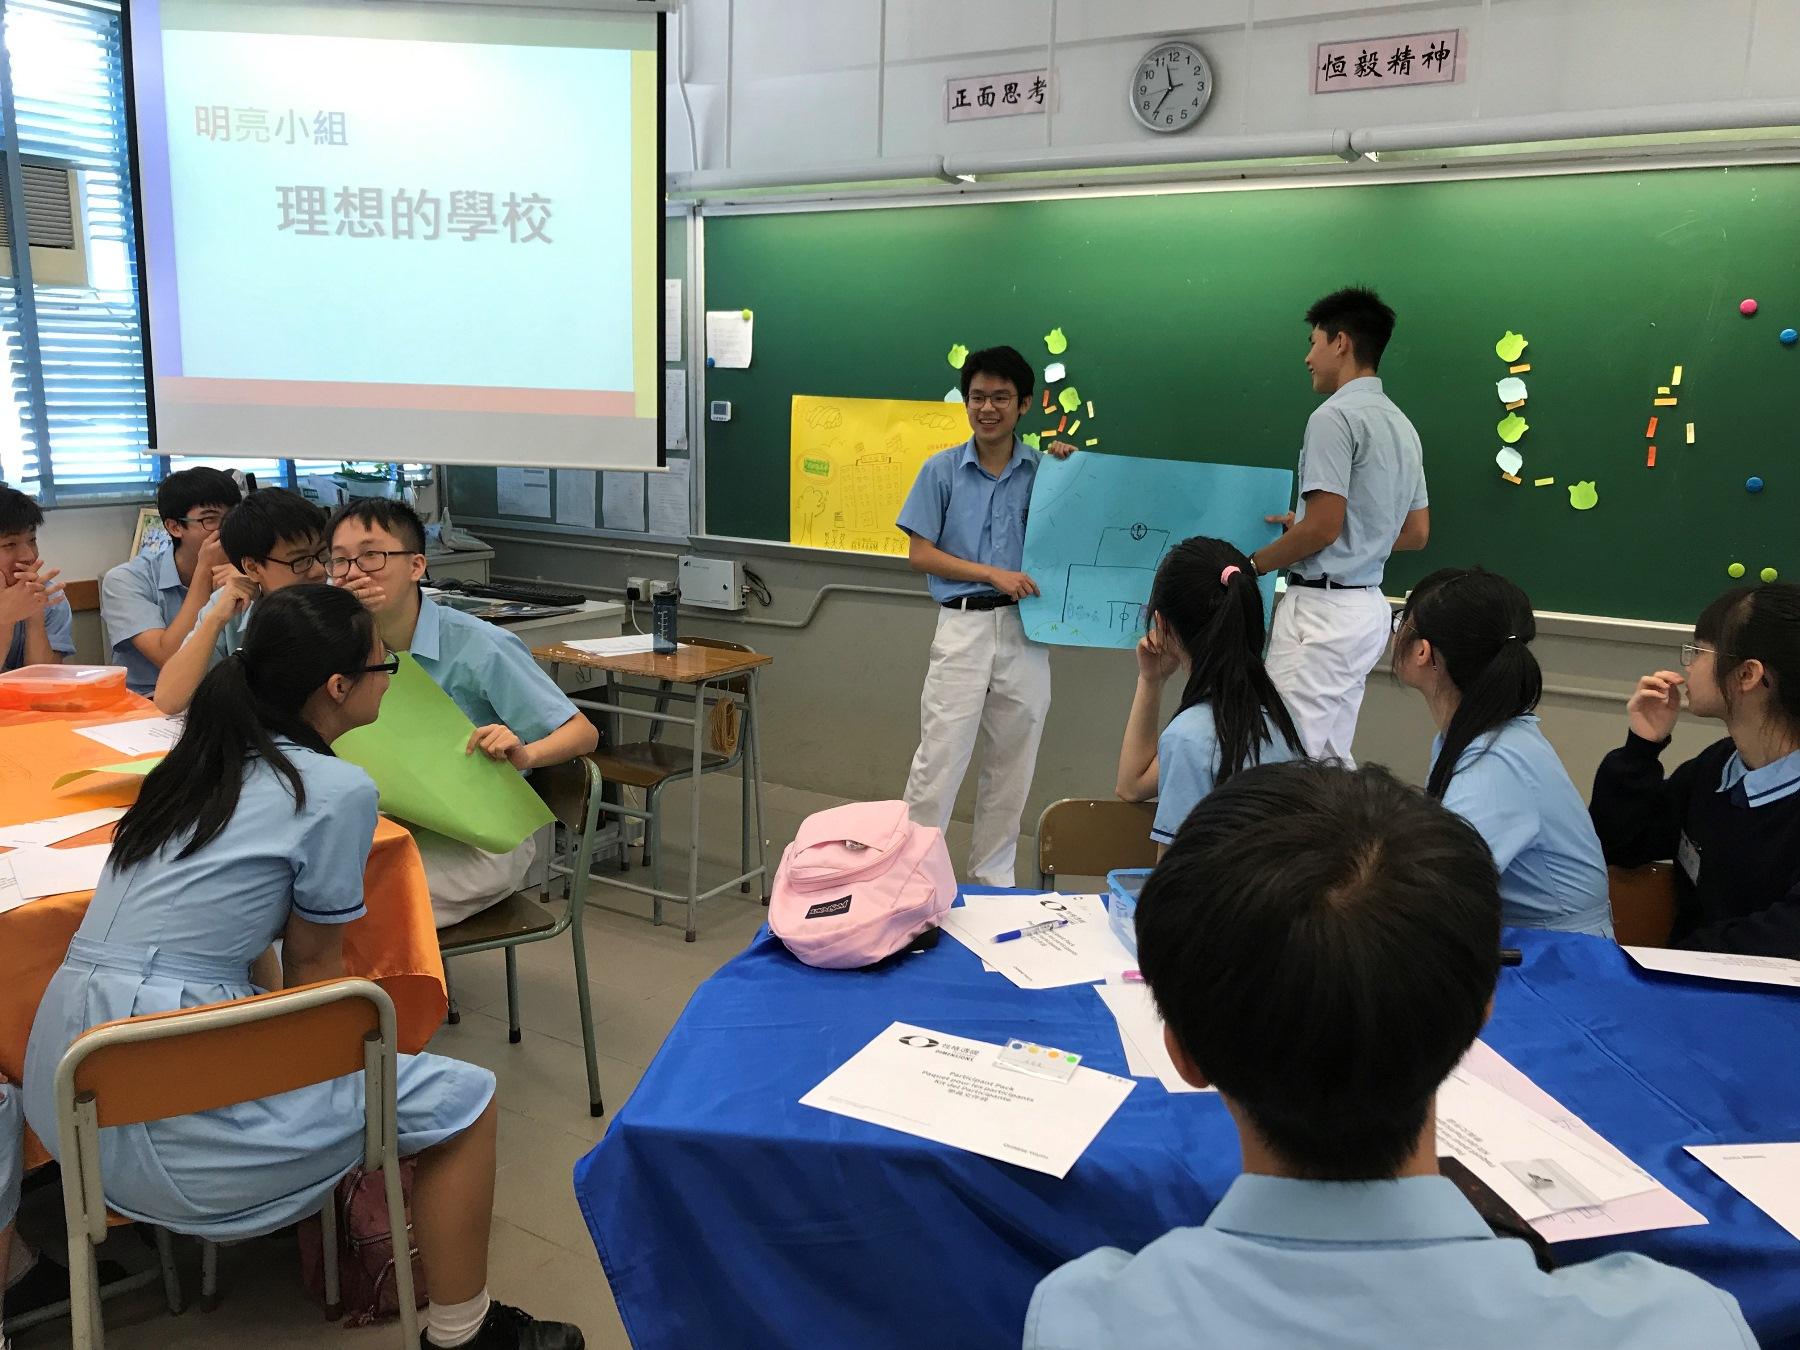 http://npc.edu.hk/sites/default/files/img_4363.jpg